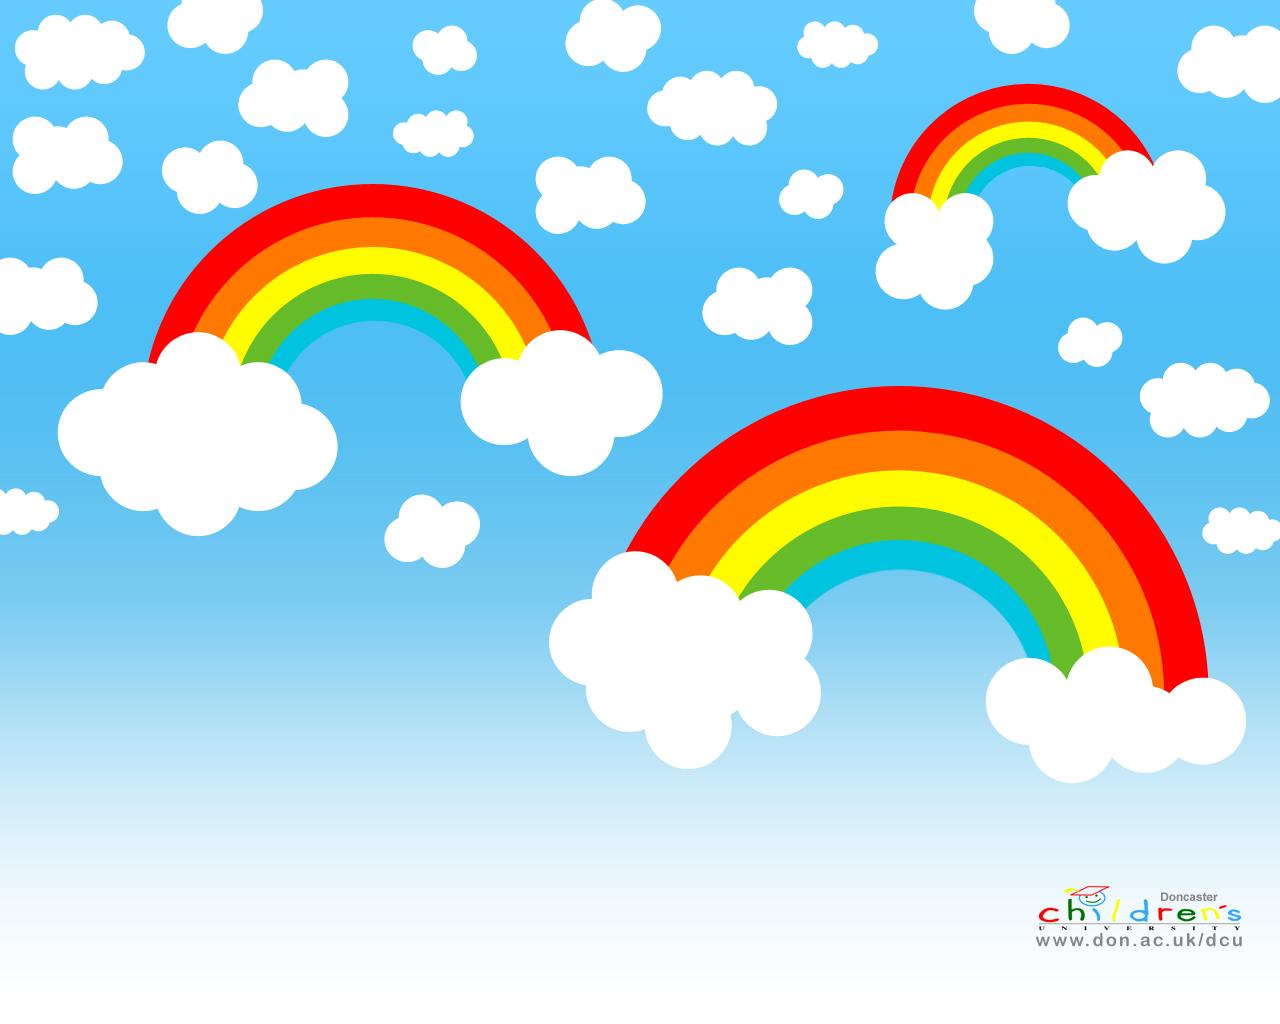 sky wallpaper, облака, небо, радуги, скачать фото, обои на рабочий стол